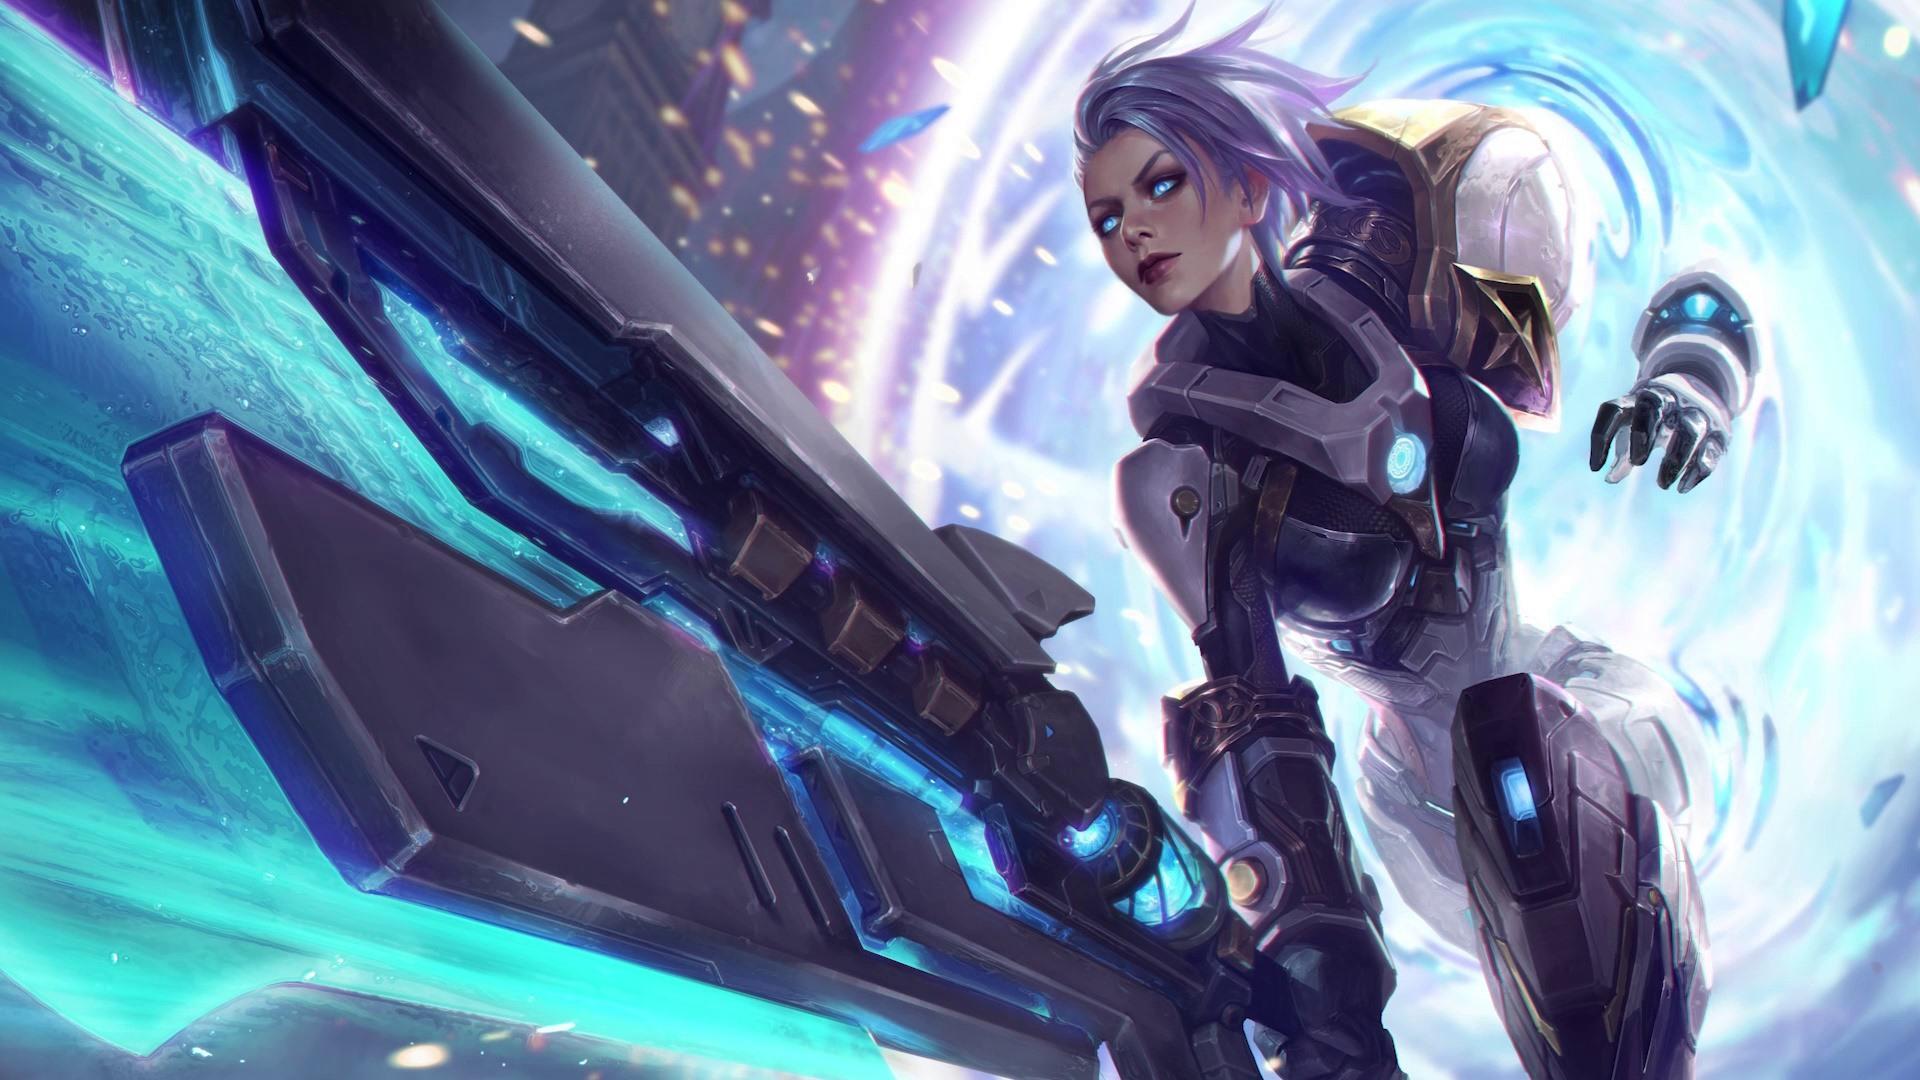 Wallpaper League Of Legends Girl Weapons 1920x1080 Full Hd 2k